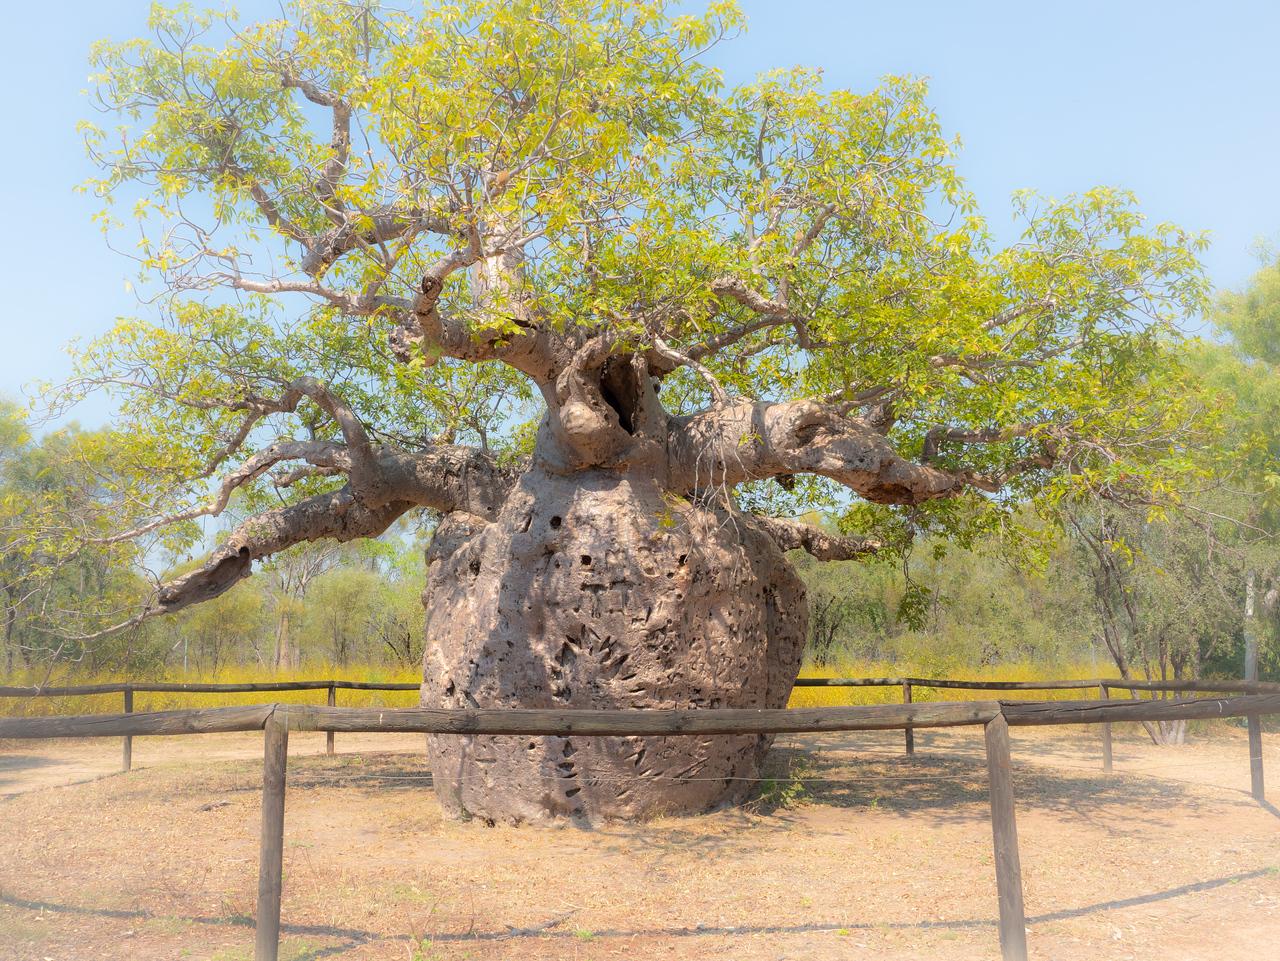 The Prison Boab Tree